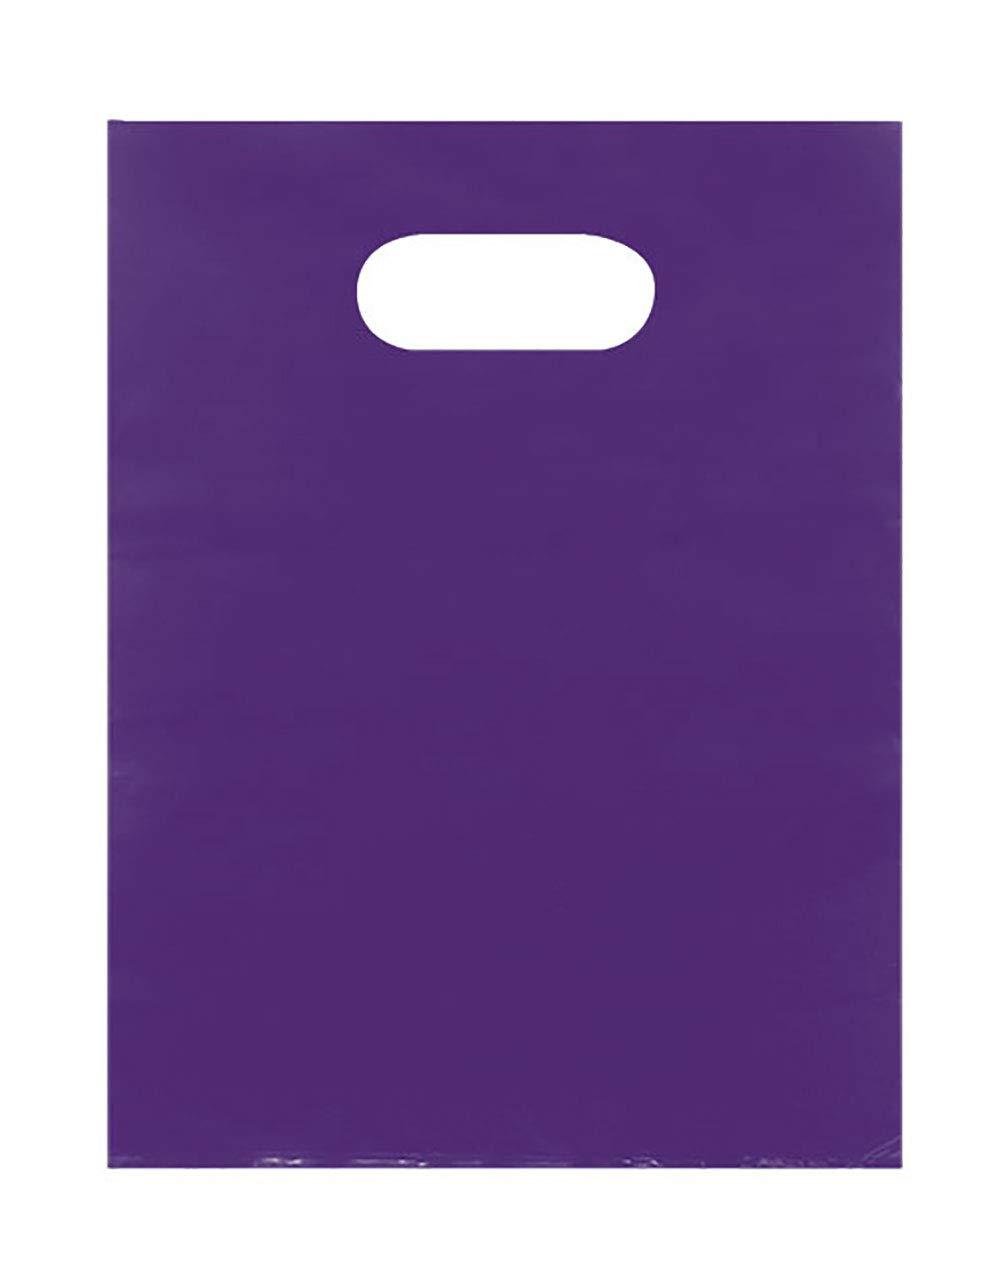 Purple Merchandise Bags - Lightweight (9x12) - Pack of 1,000